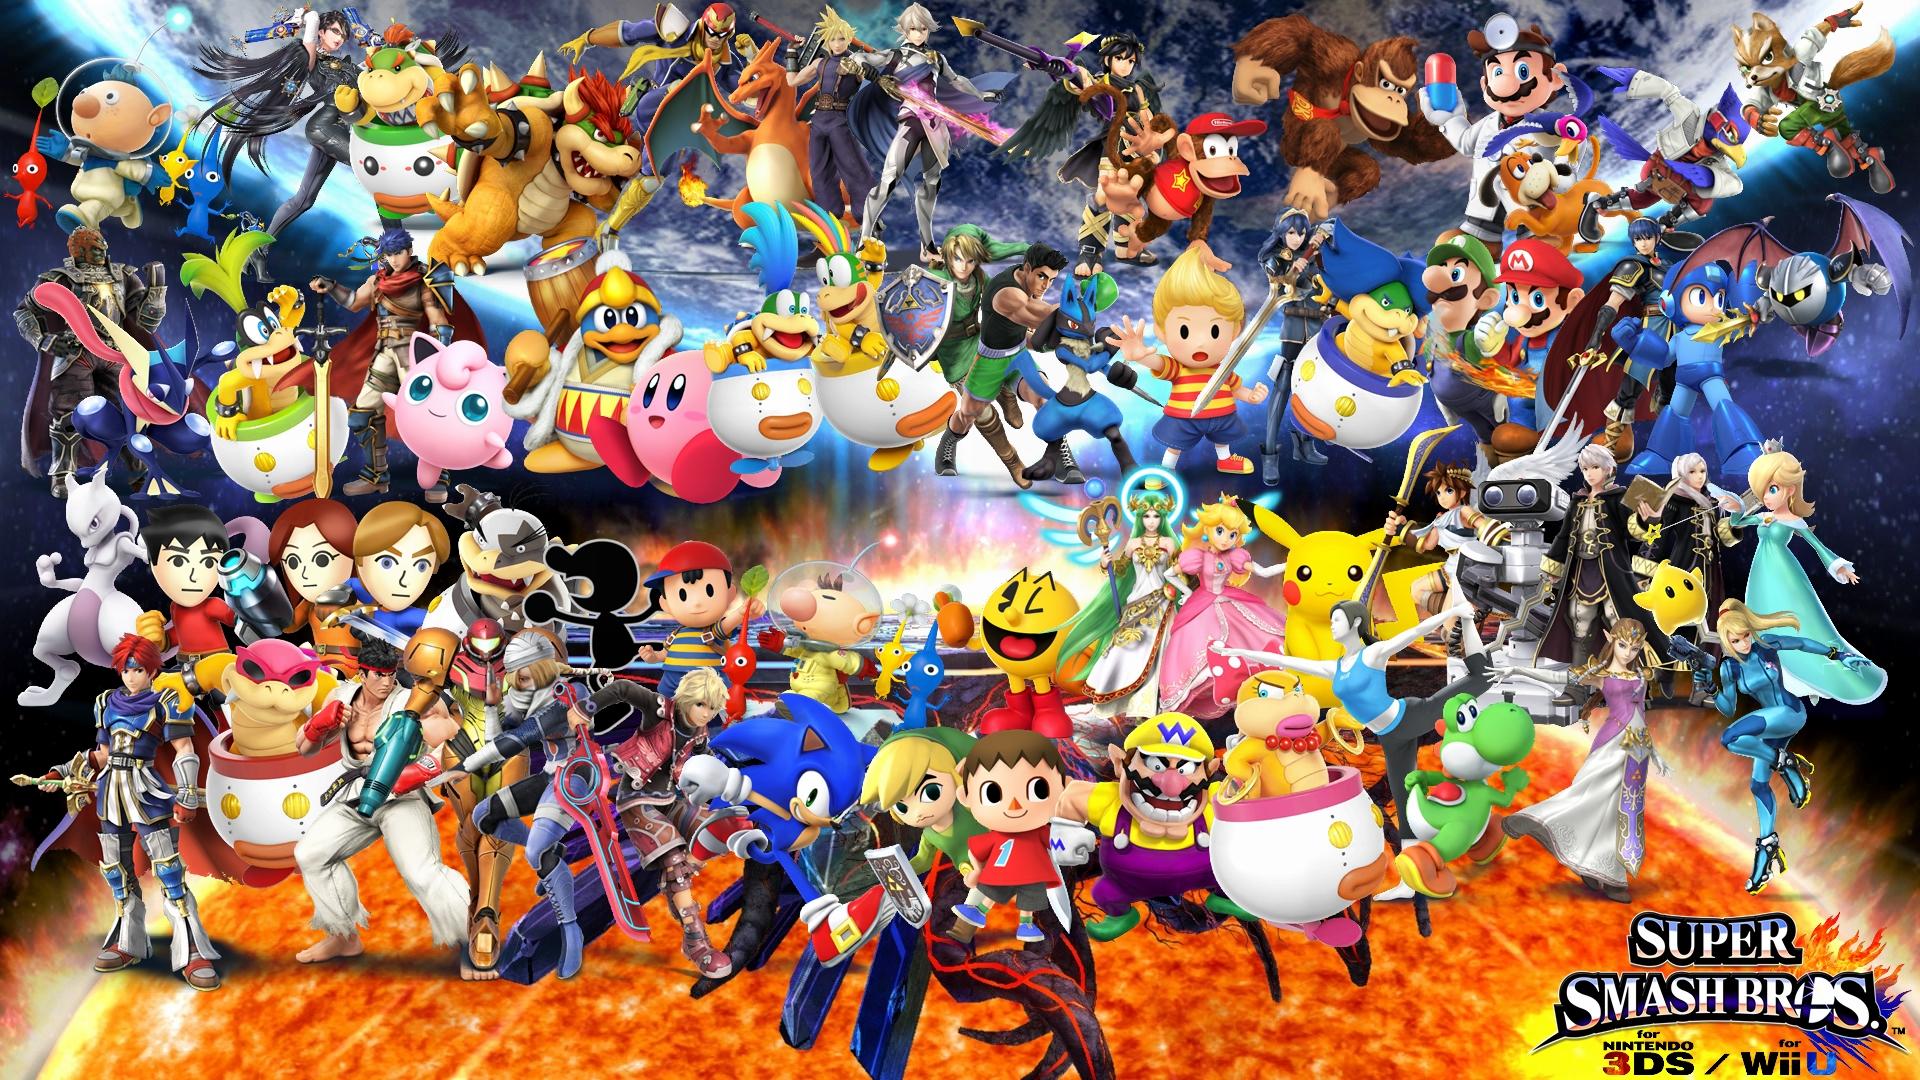 Super Smash Bros 4 Wallpaper By Yoink13 On Deviantart